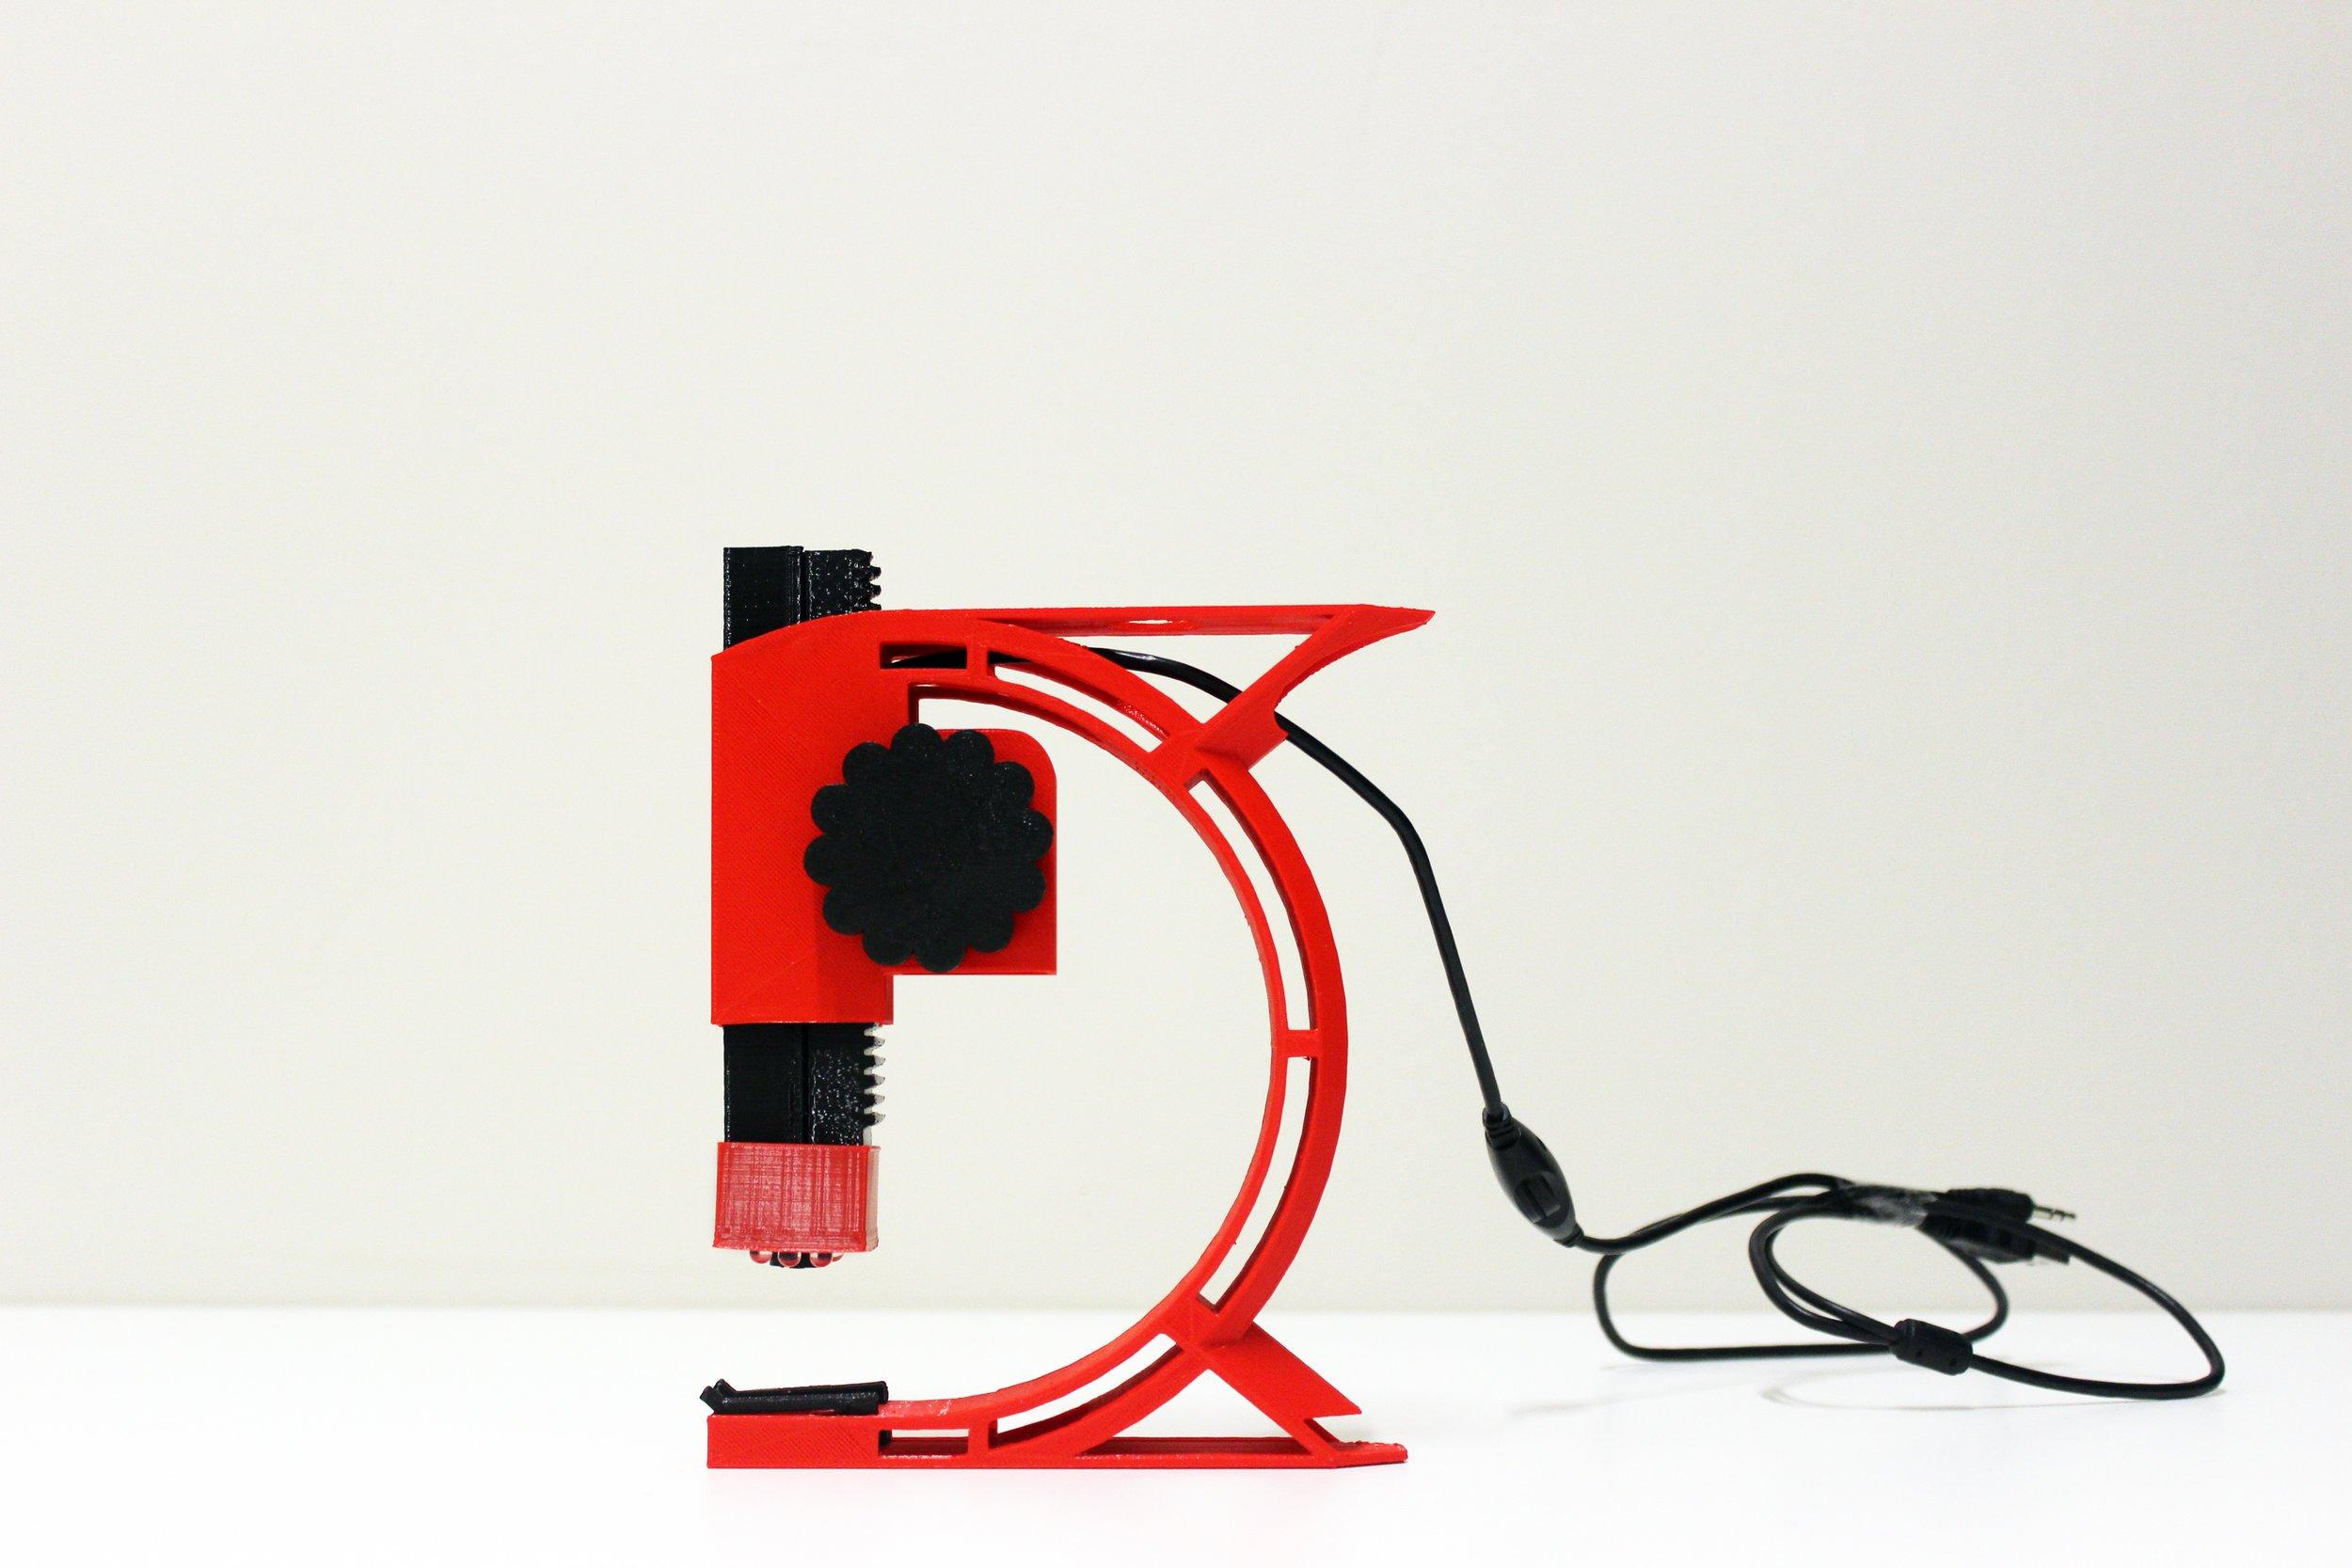 Design of the Week: Box Microscope